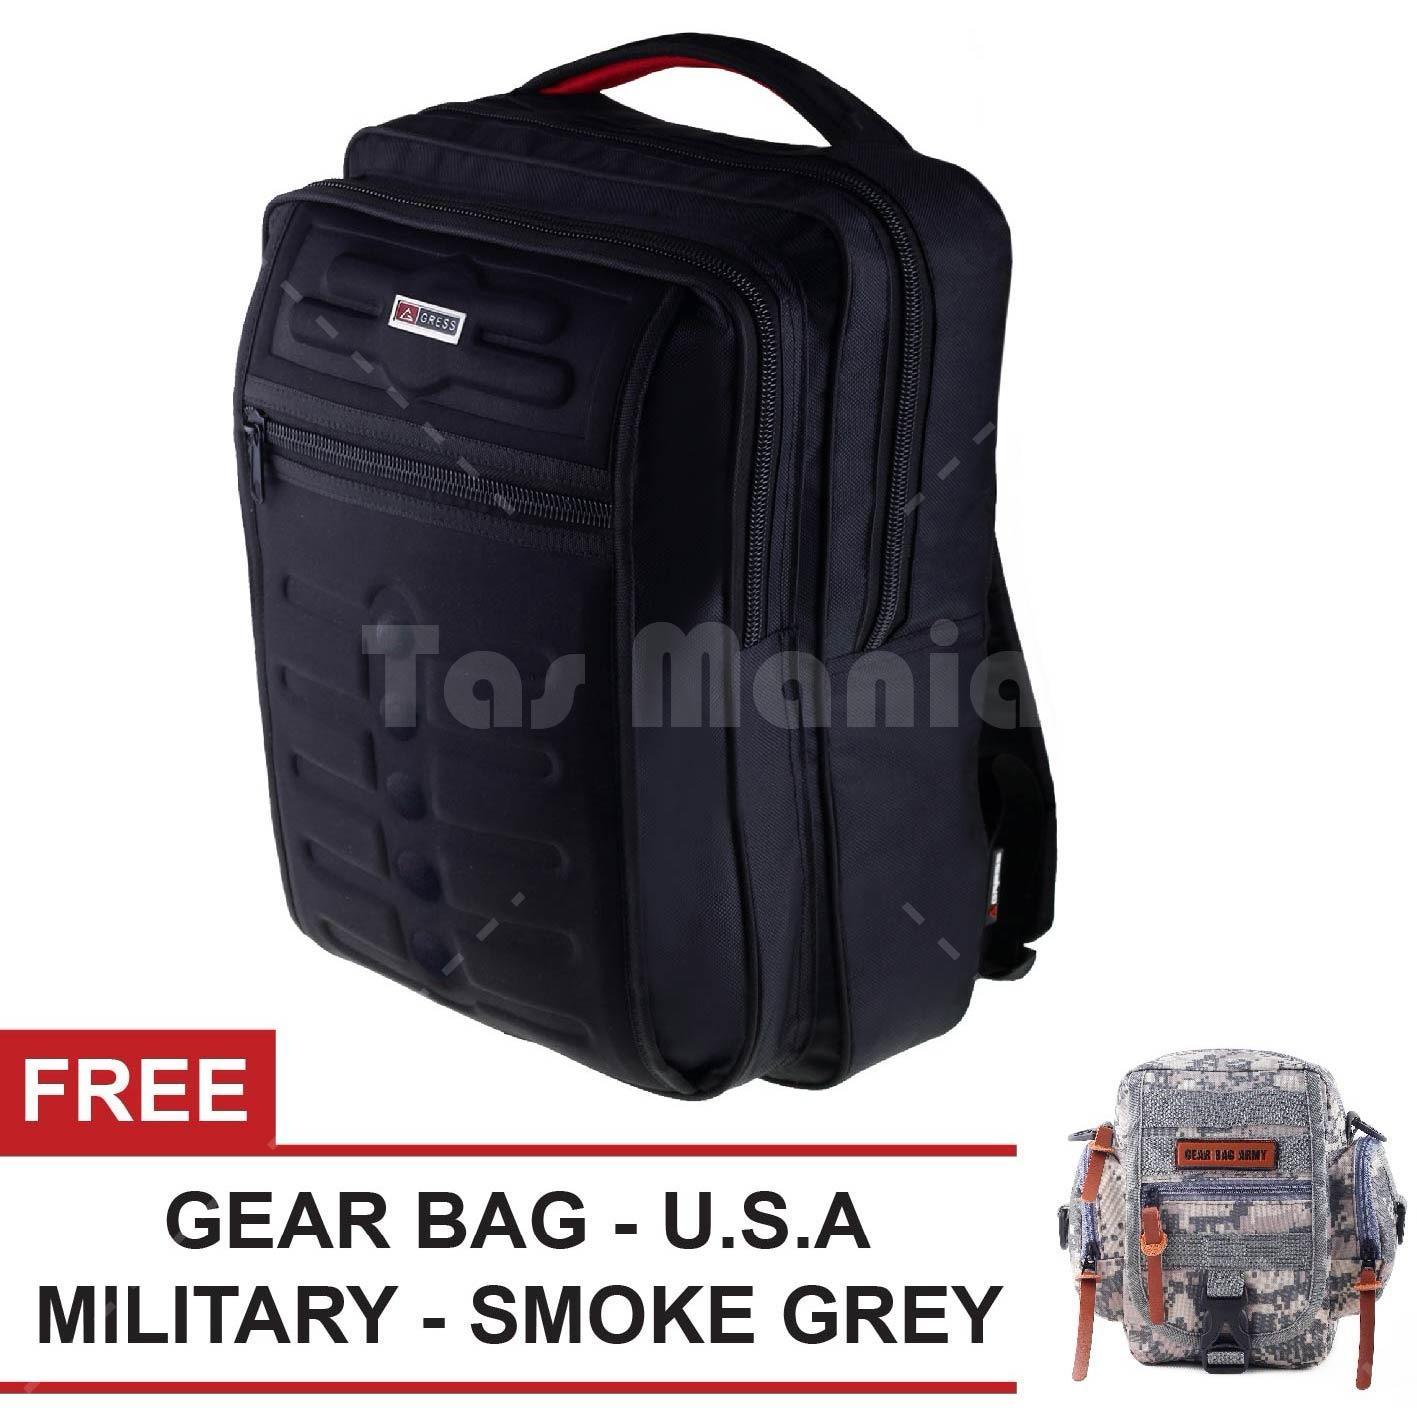 Tas Ransel Gress Emboss Tas Laptop Backpack - Hitam + FREE Tas Selempang U.S.A Military - Smoke Grey Tas Pria Tas Kerja Tas Messenger Tas Slempang Tas Fashion Pria